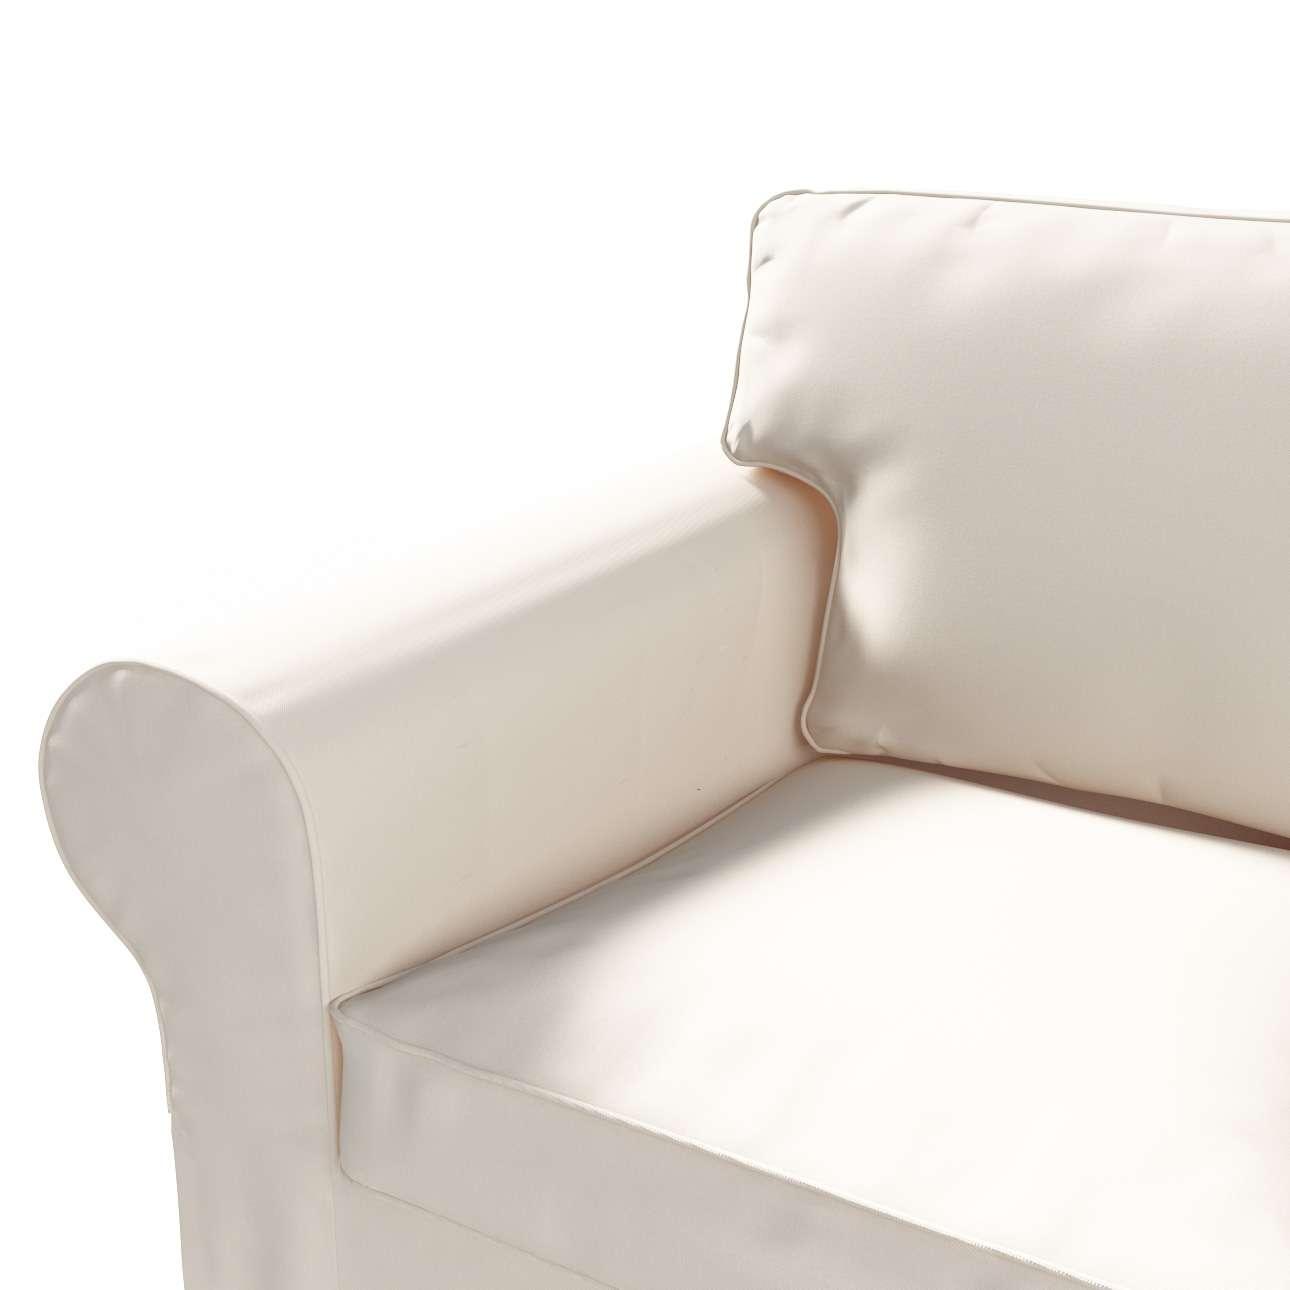 Ektorp 2-Sitzer Schlafsofabezug  ALTES Modell Sofabezug Ektorp 2-Sitzer Schlafsofa altes Modell von der Kollektion Etna, Stoff: 705-01